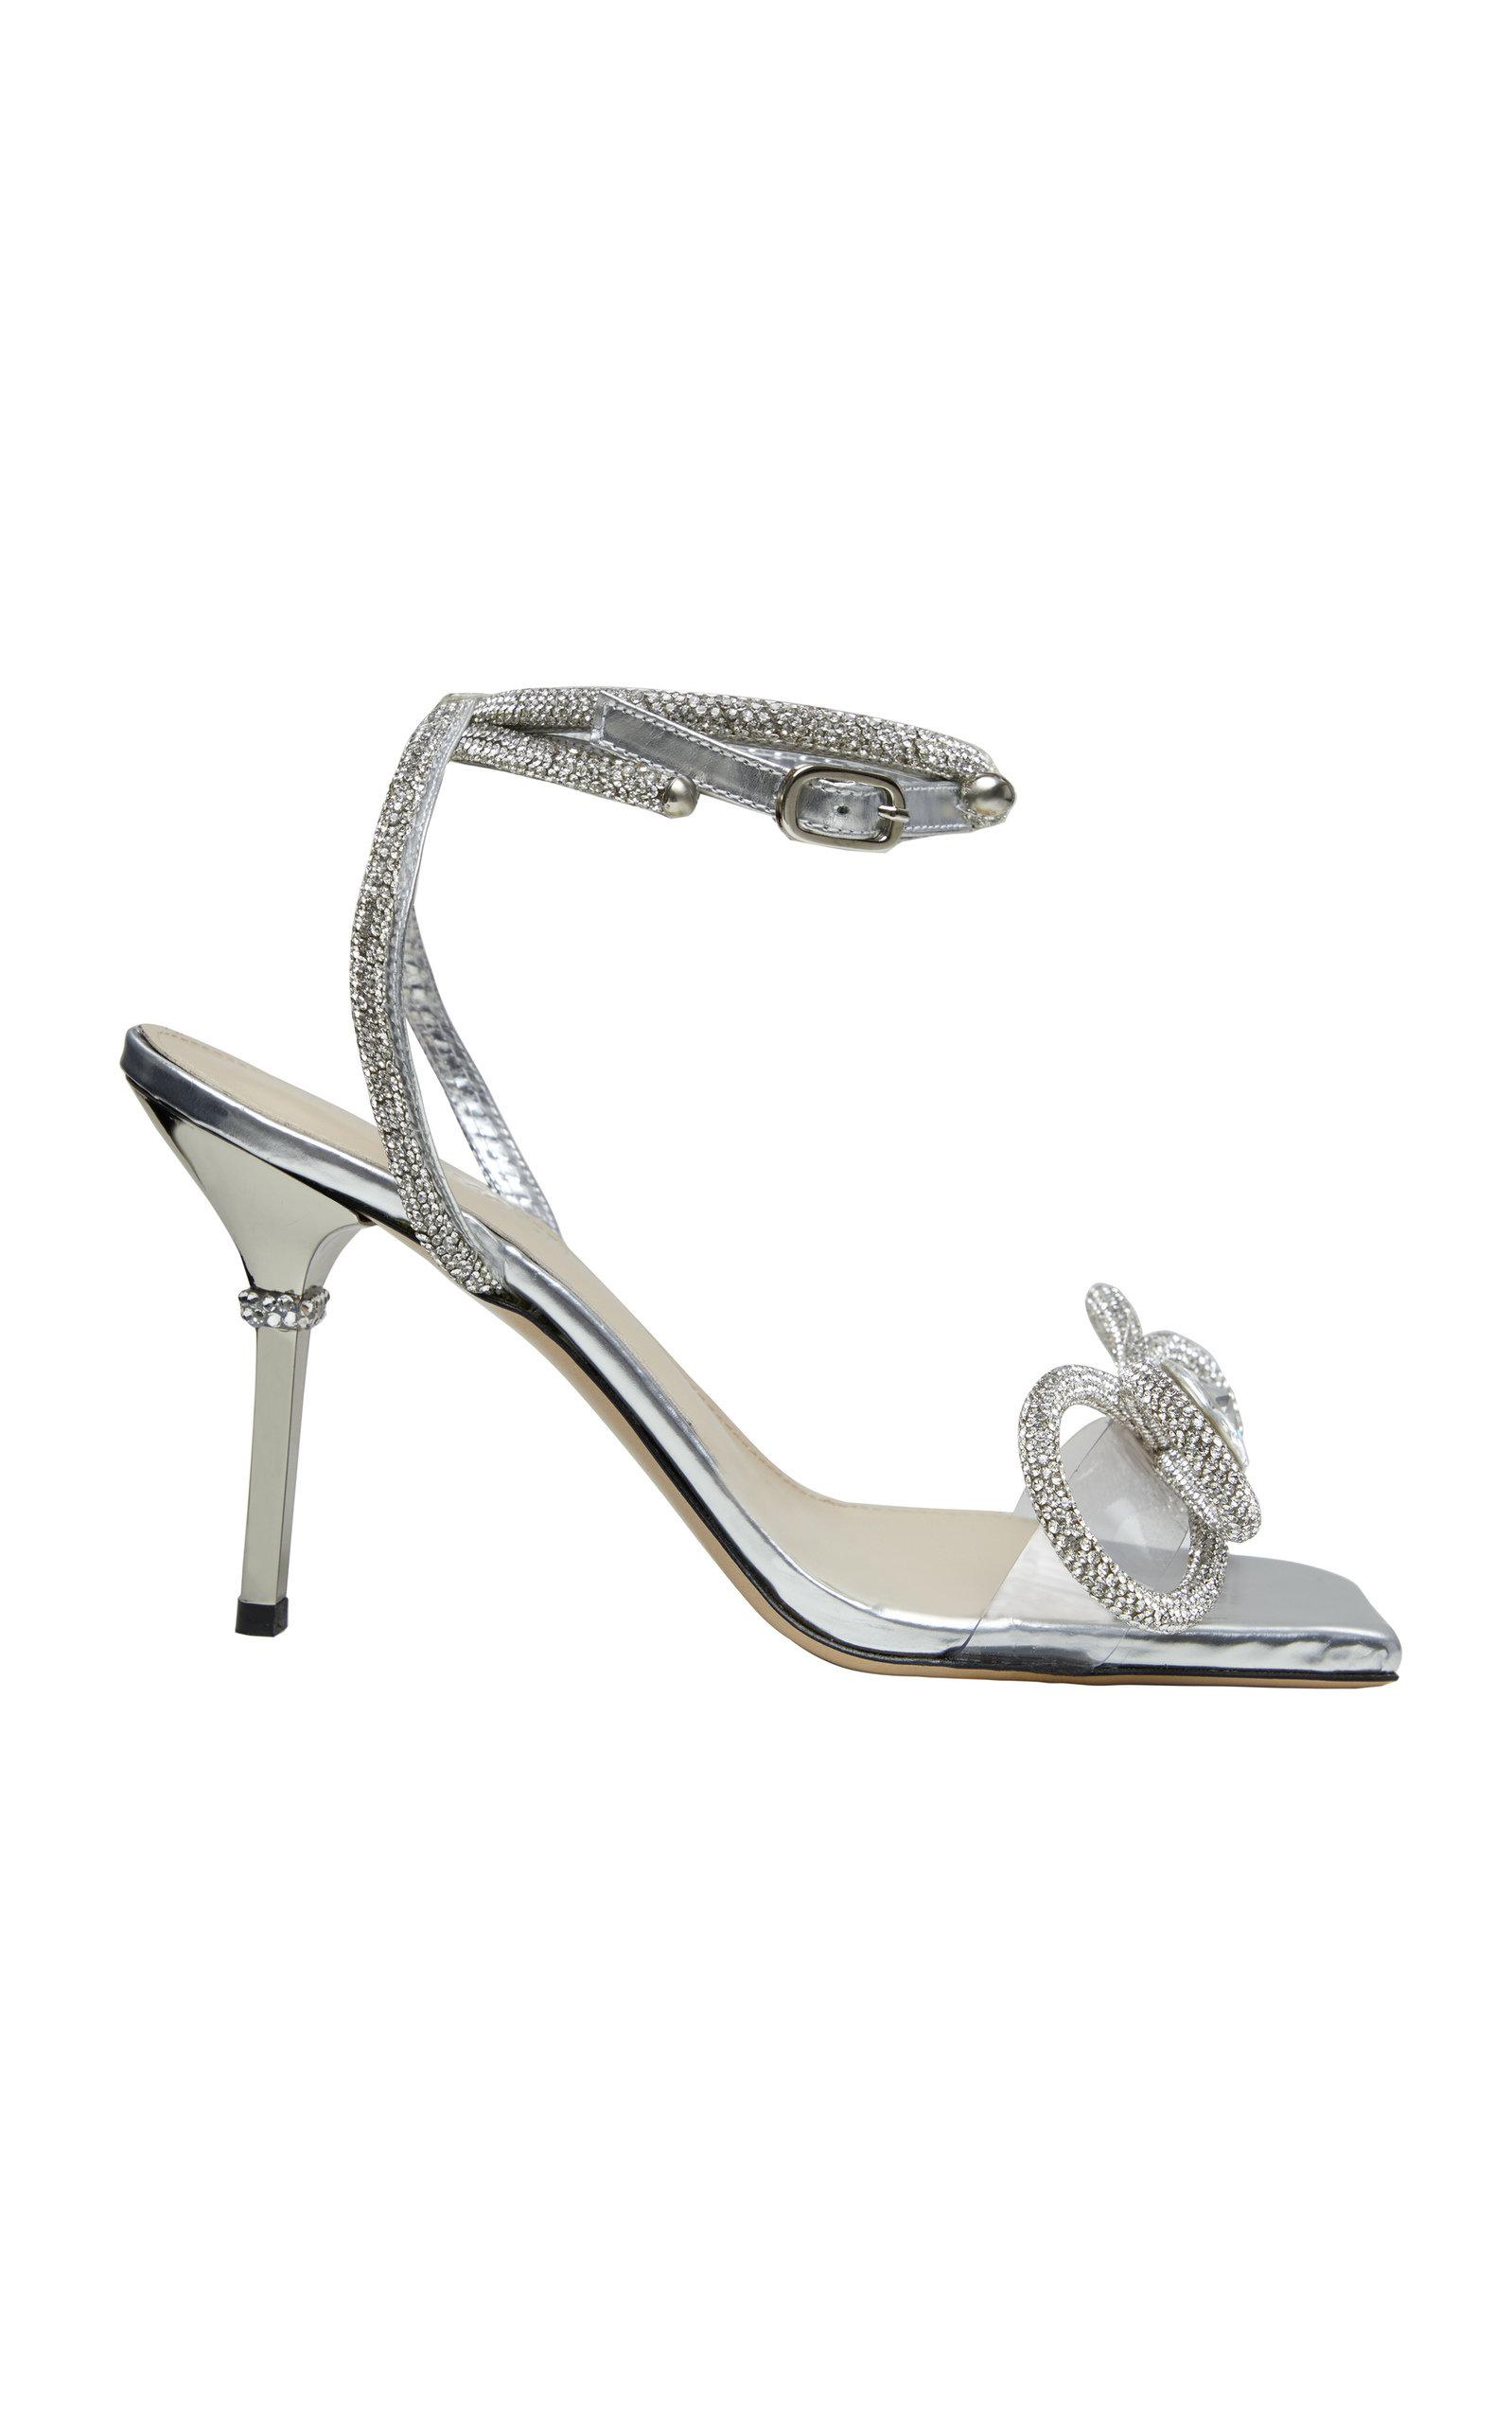 Women's Crystal Bow-Embellished Sandals